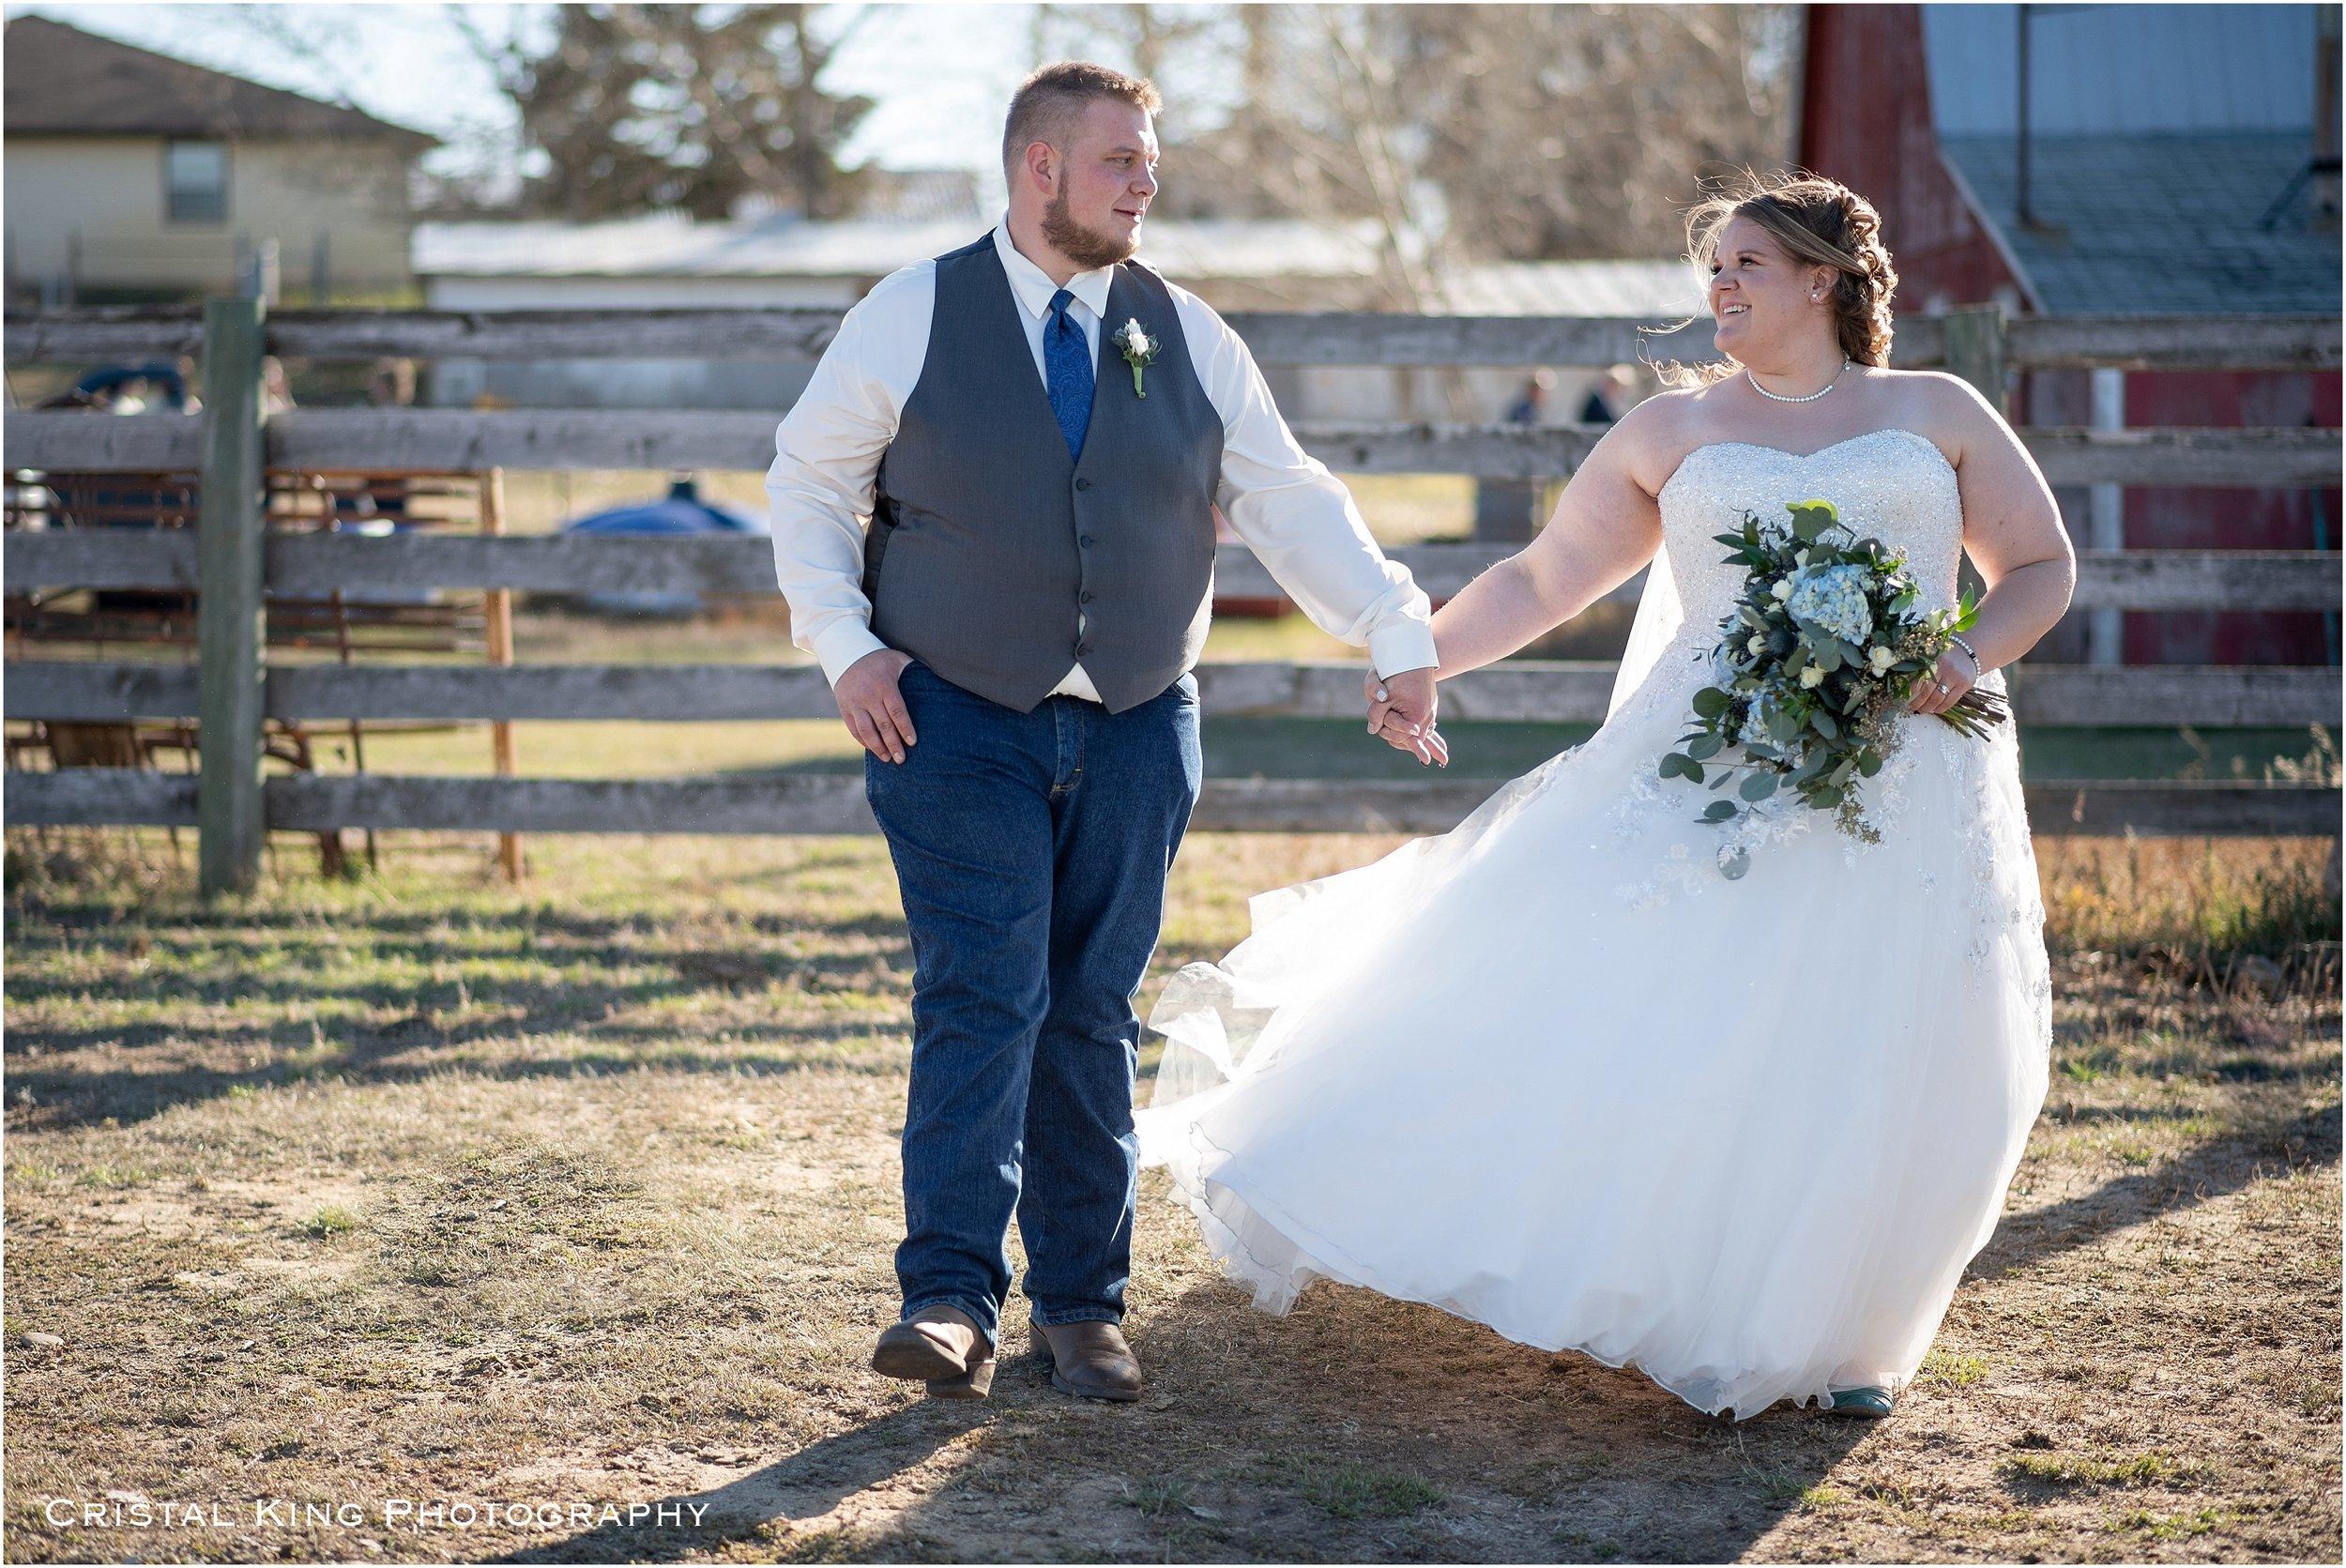 Tracy-Kyles-Wedding-102.jpg